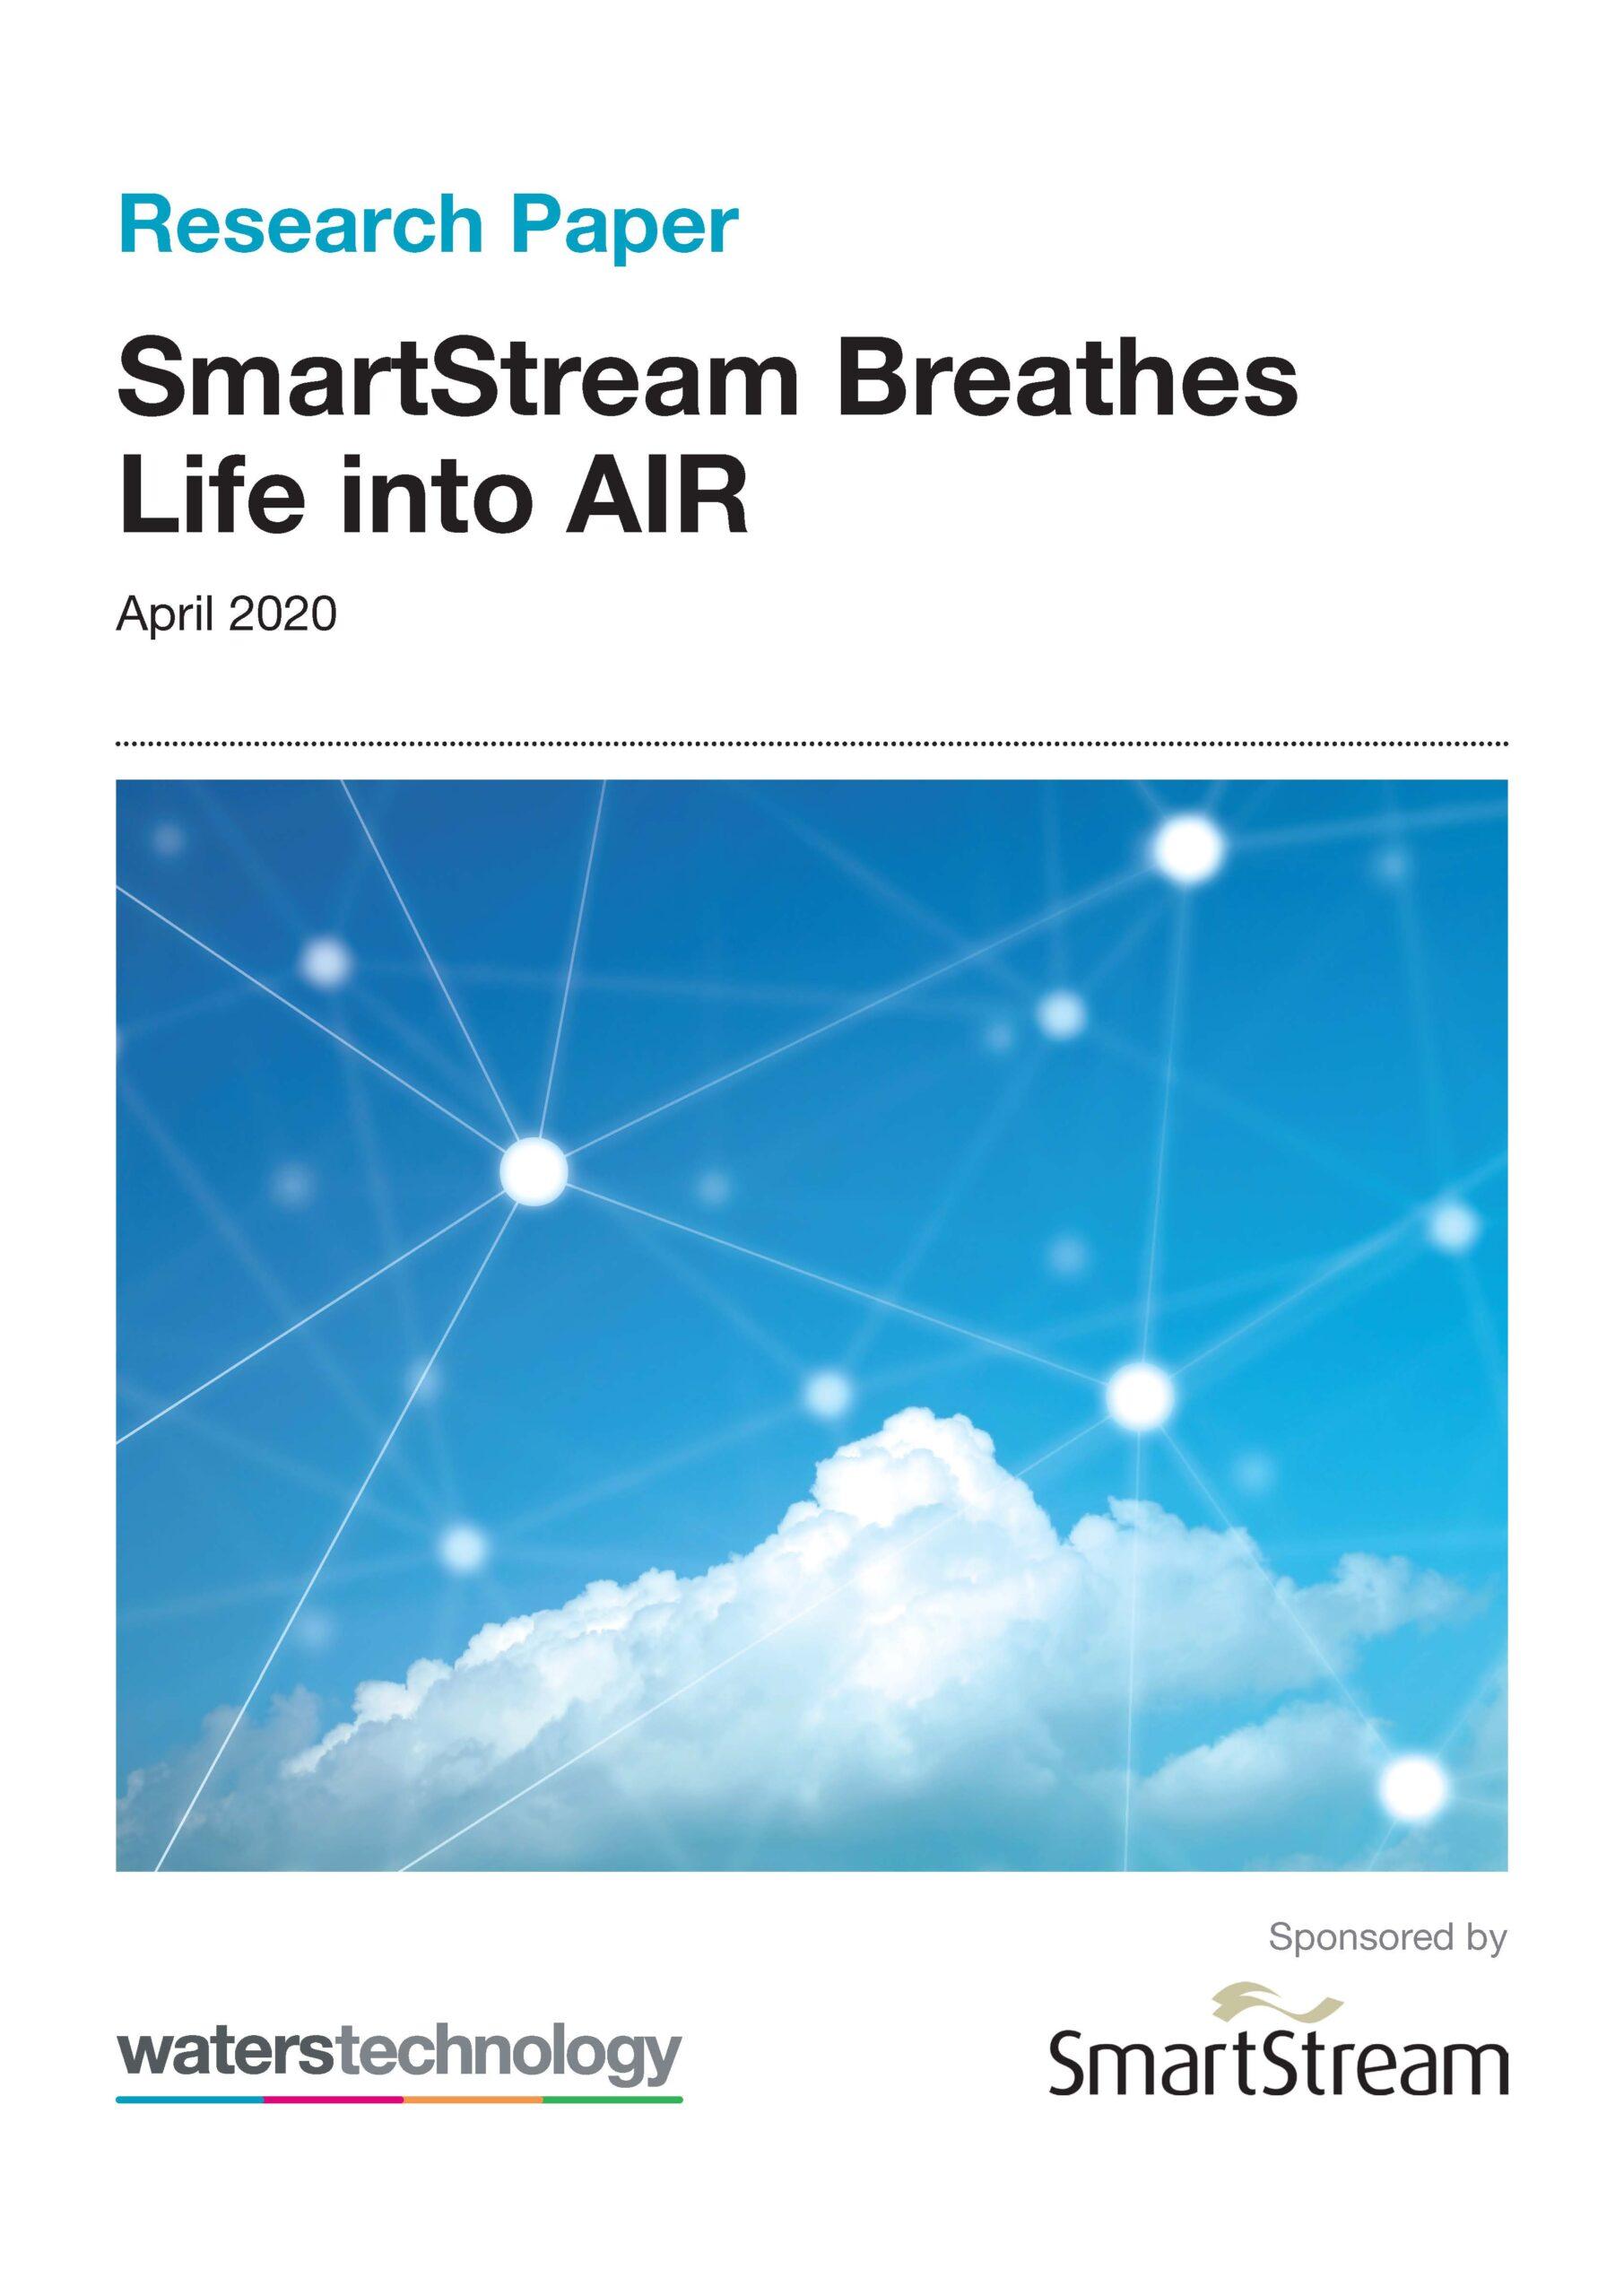 SmartStream Breathes